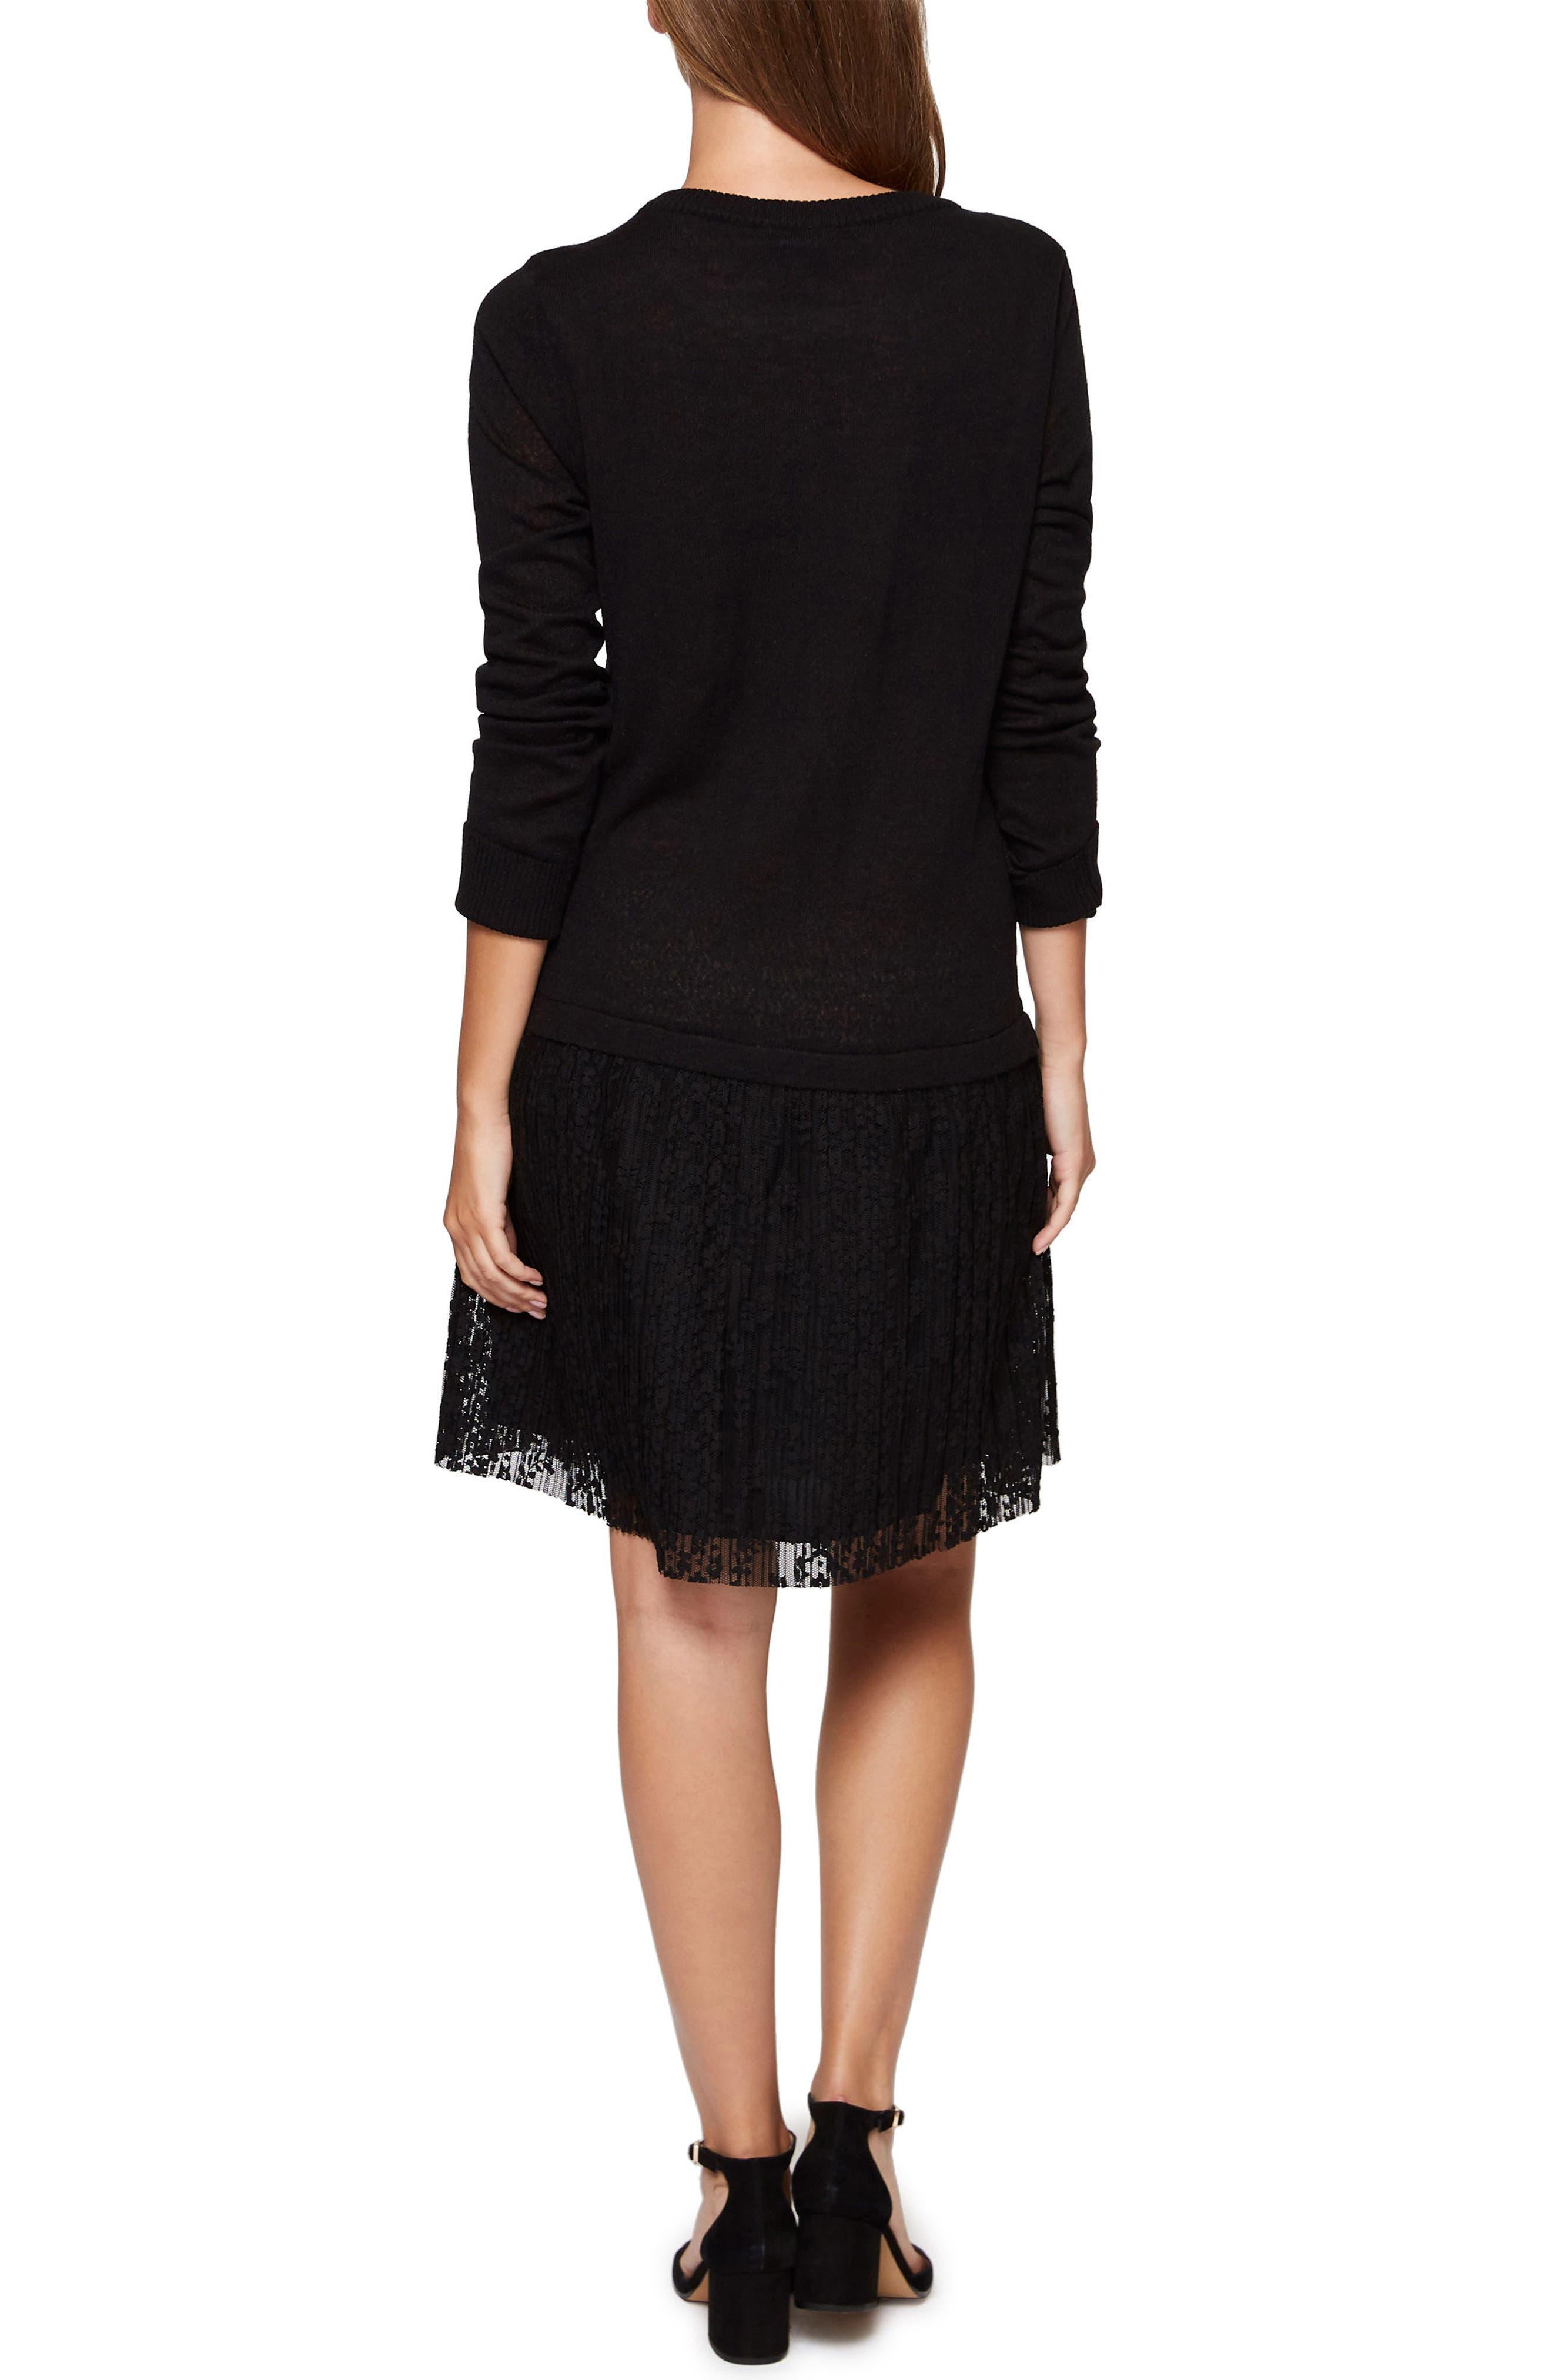 Sophie Lace Skirt Sweater Dress,                             Alternate thumbnail 2, color,                             001